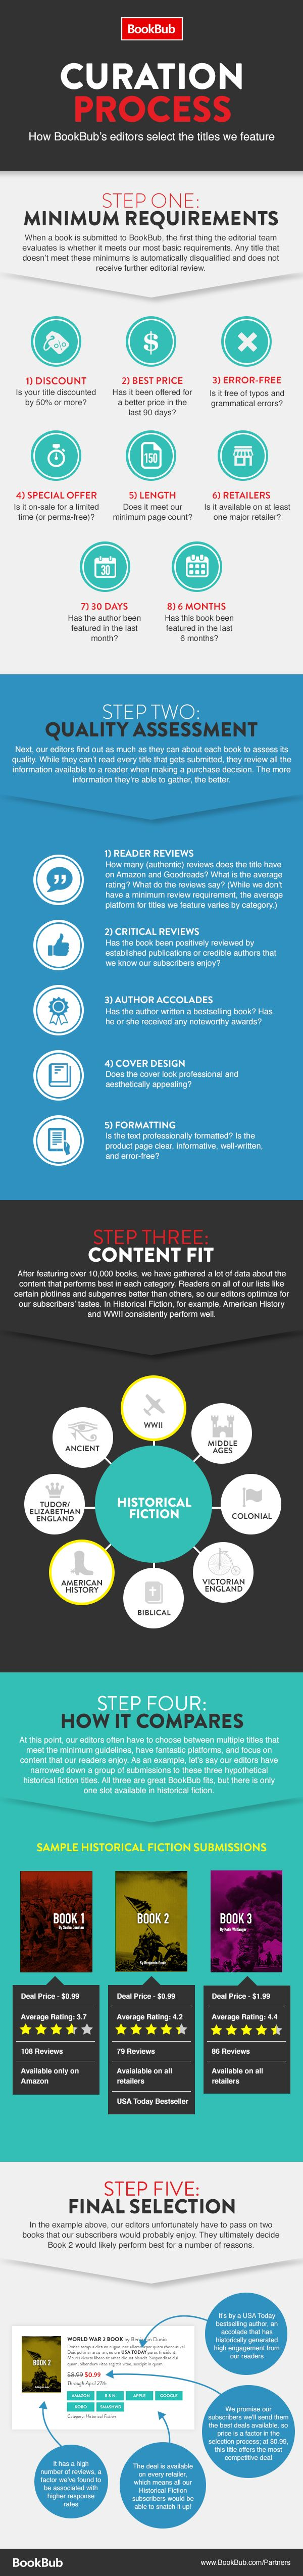 Best essay writing service usa image 3